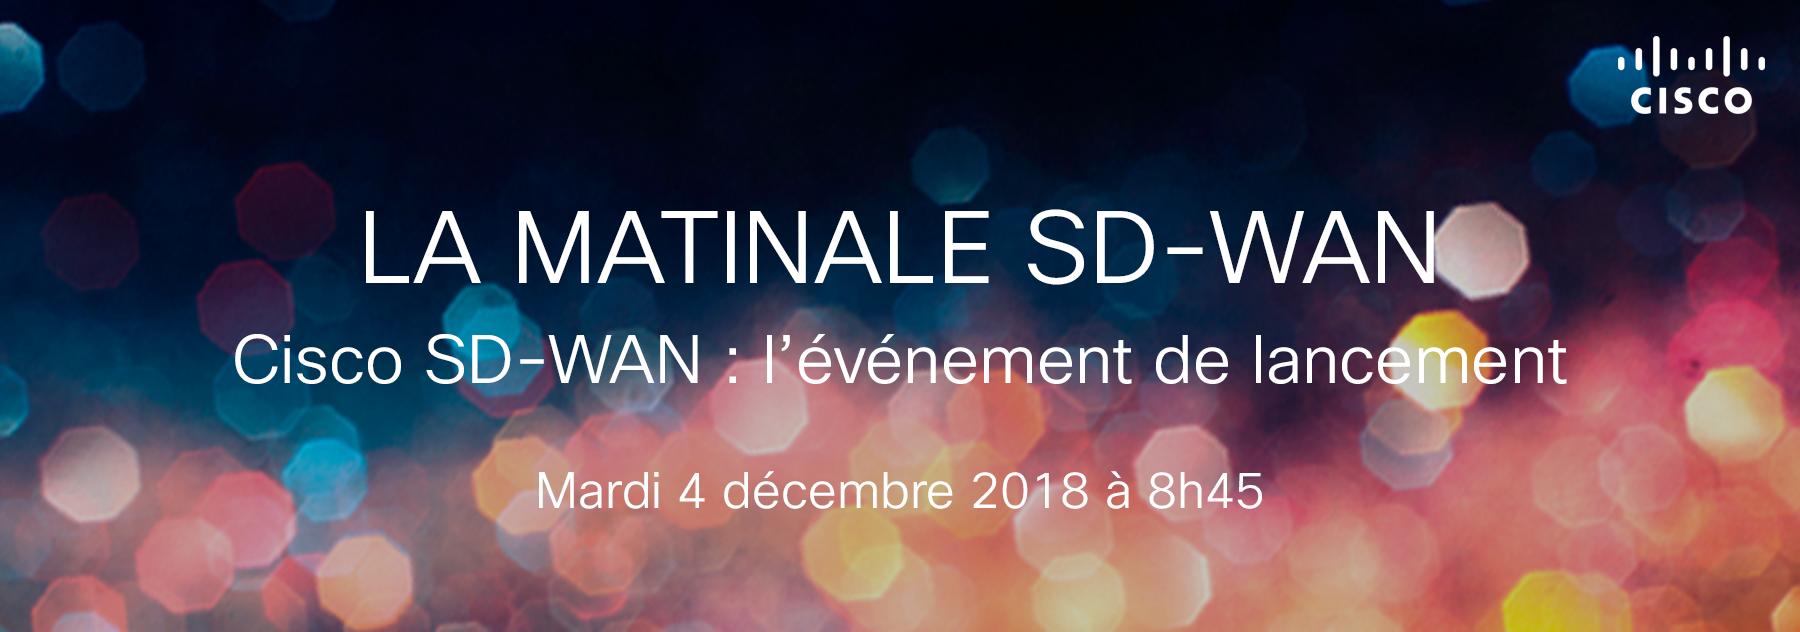 LA MATINALE SD-WAN